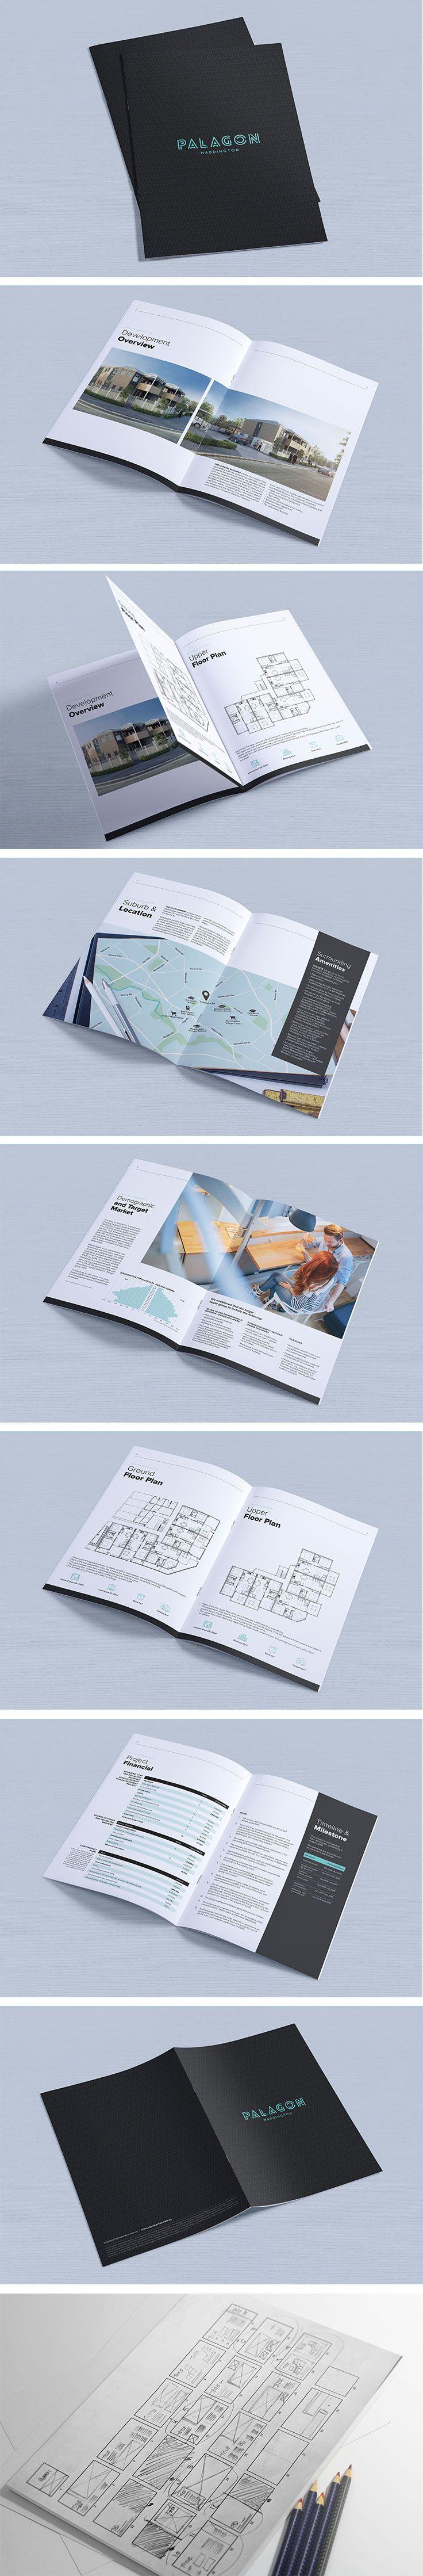 Property Brochure Design  |  Real Estate, Marketing & Investment |  Palagon Maddington Residence  |  Valhalla Creative Design, Perth